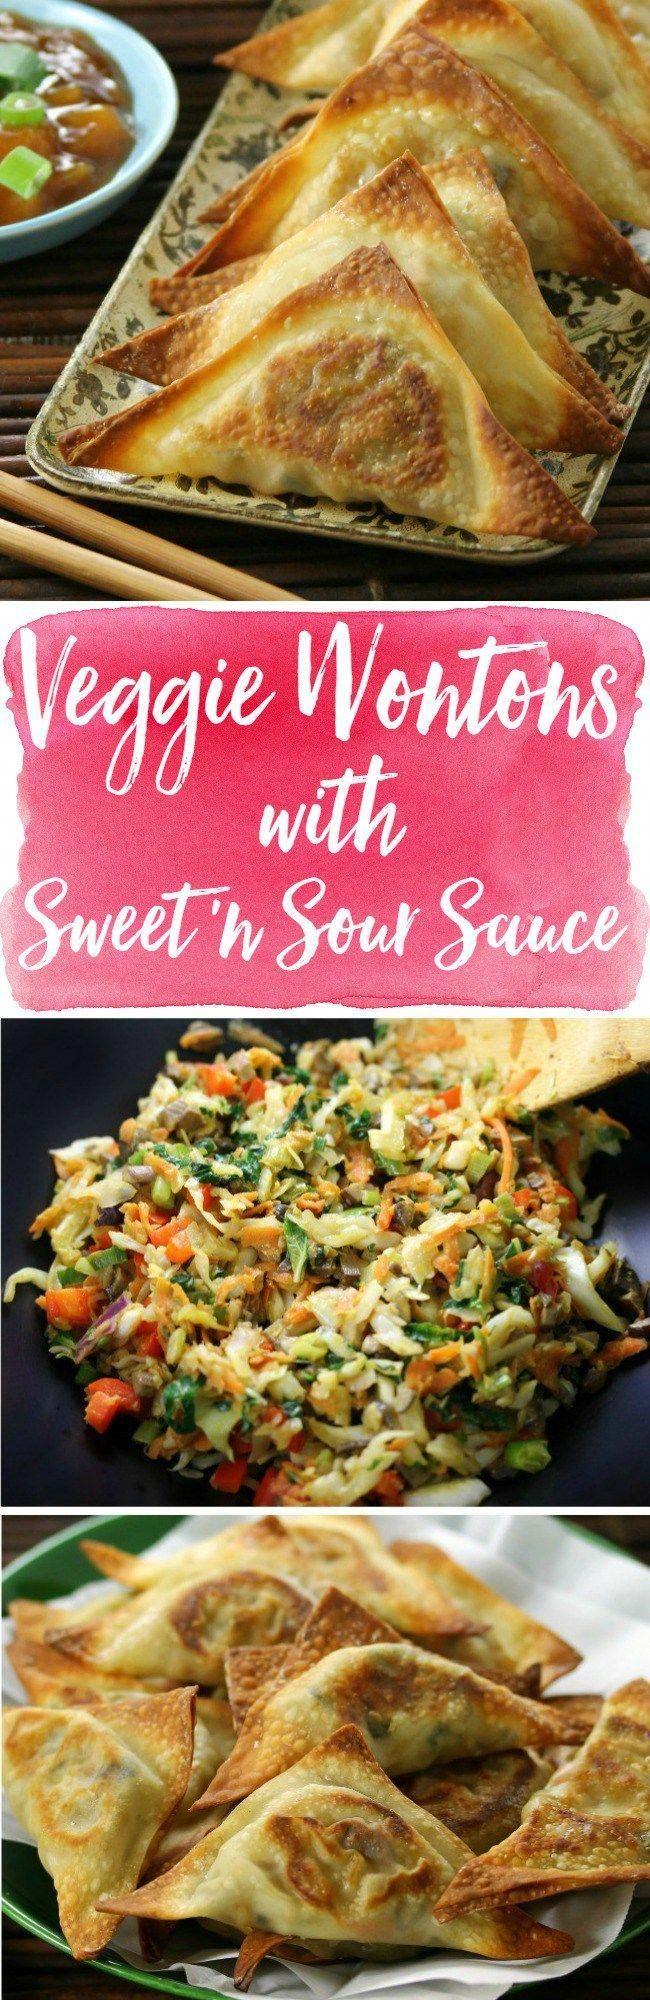 new food recipes vegetarian | vegetarian dinner entrees